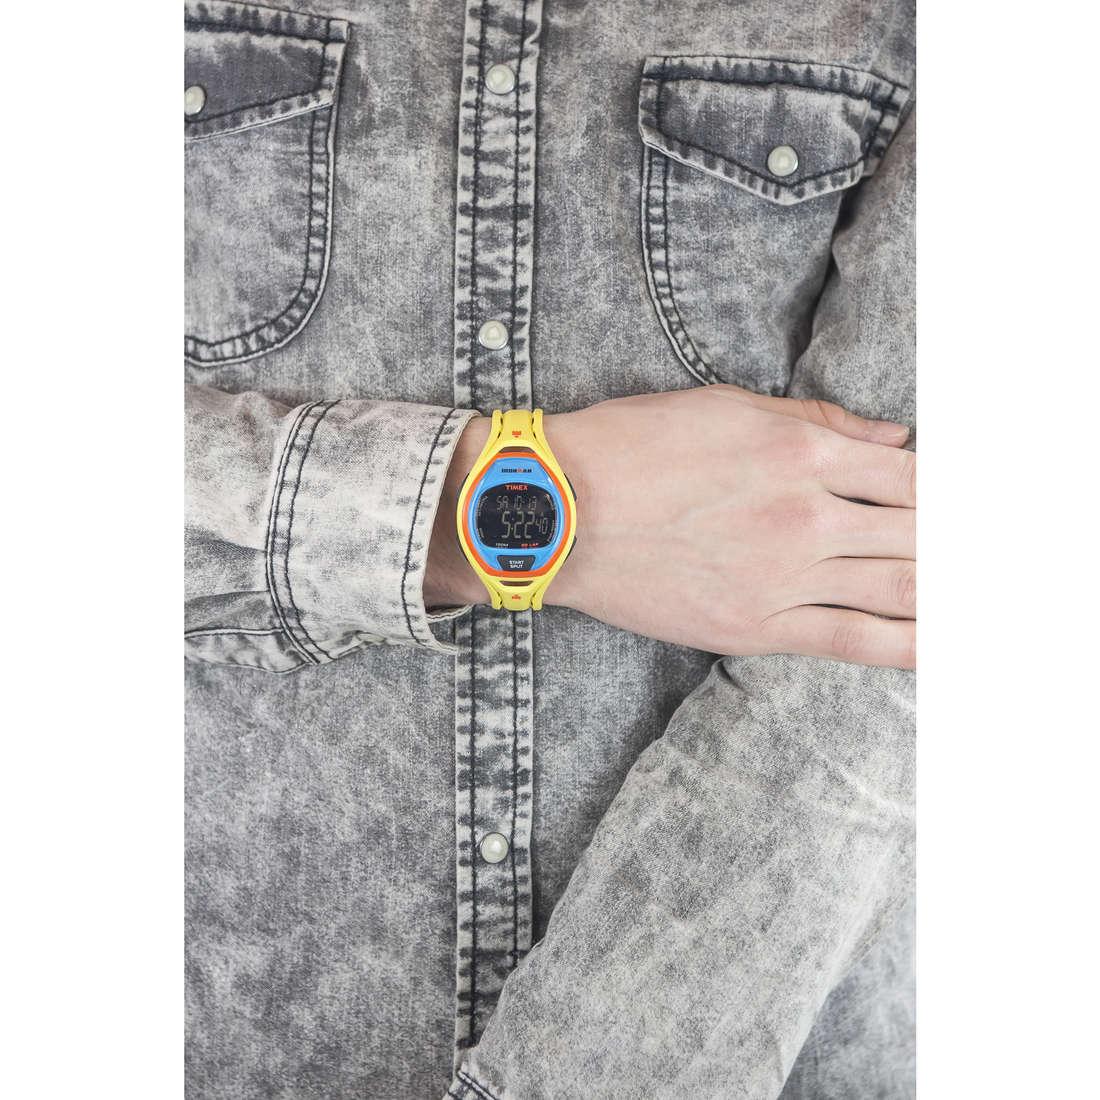 Timex digitali Ironman Colors uomo TW5M01500 indosso